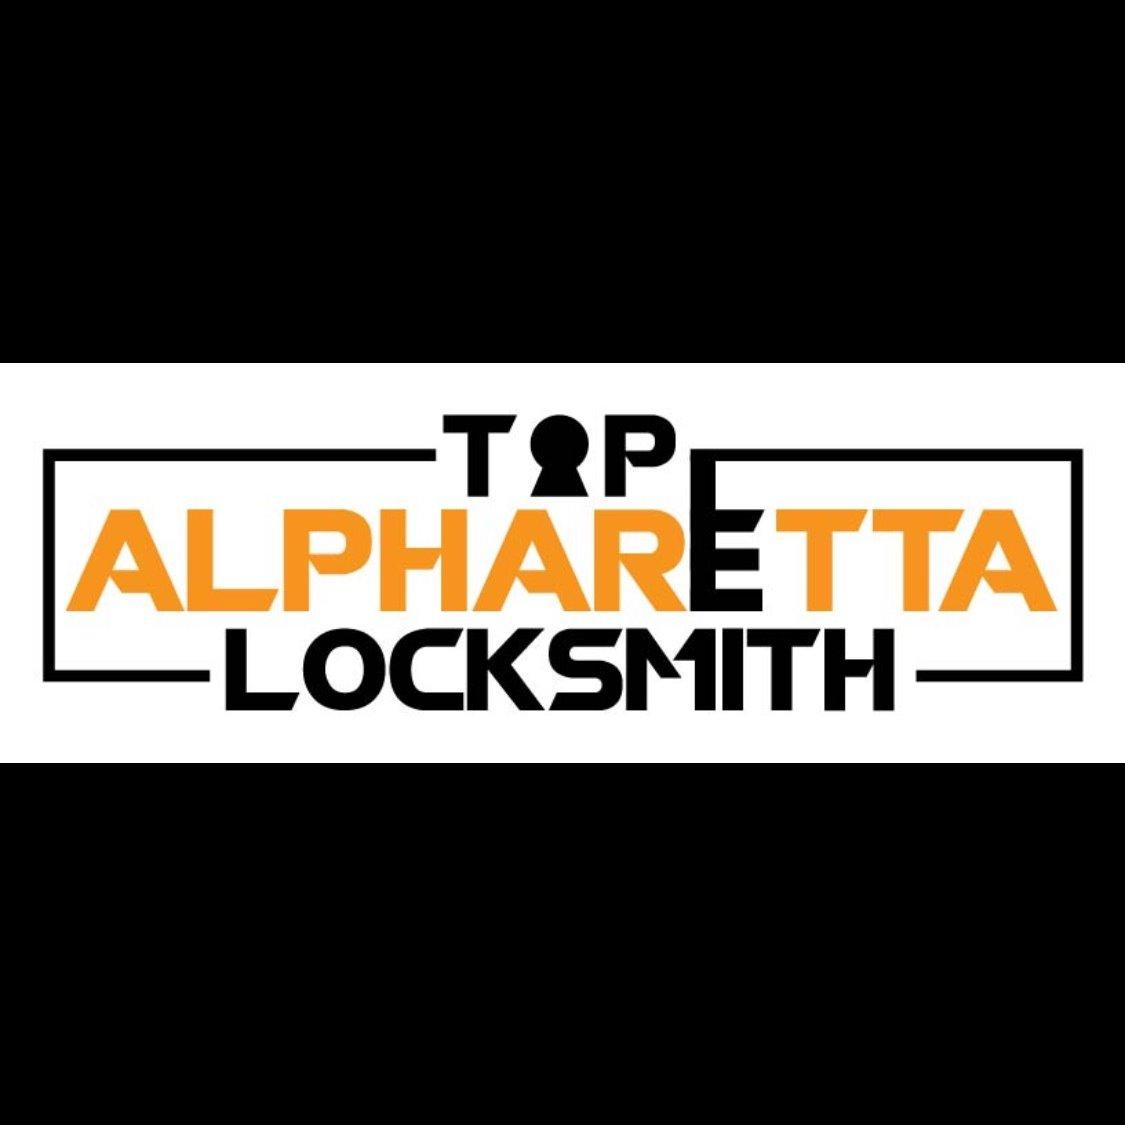 Top Alpharetta Locksmith LLC